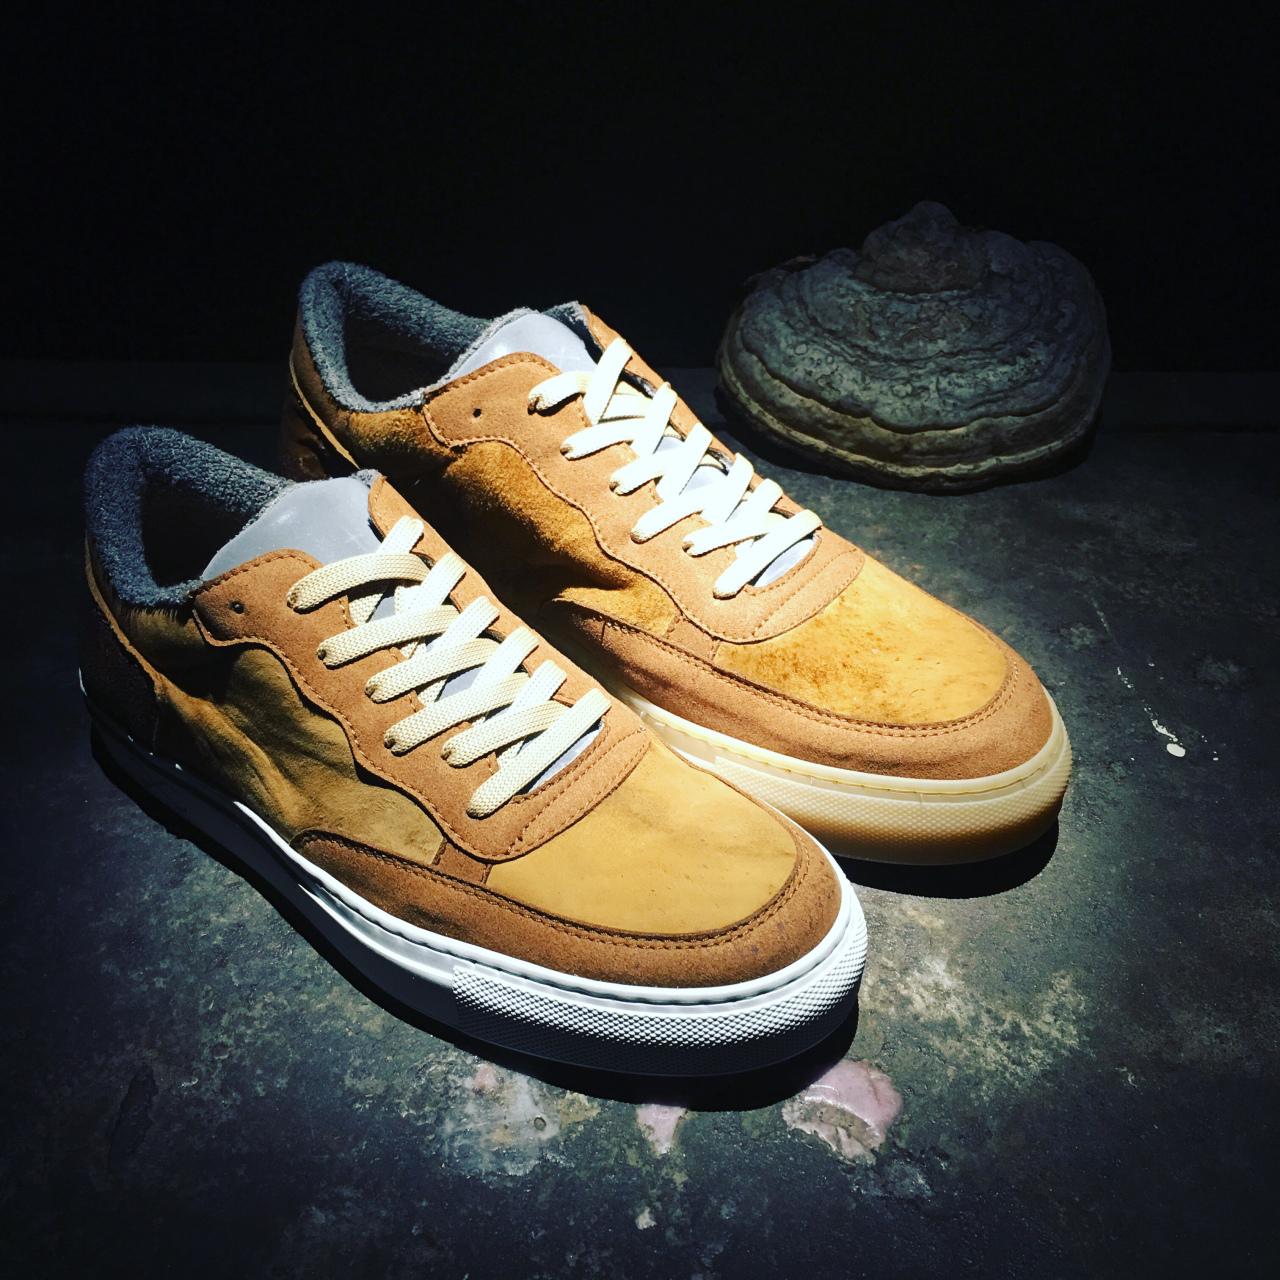 mushroom leather sneakers